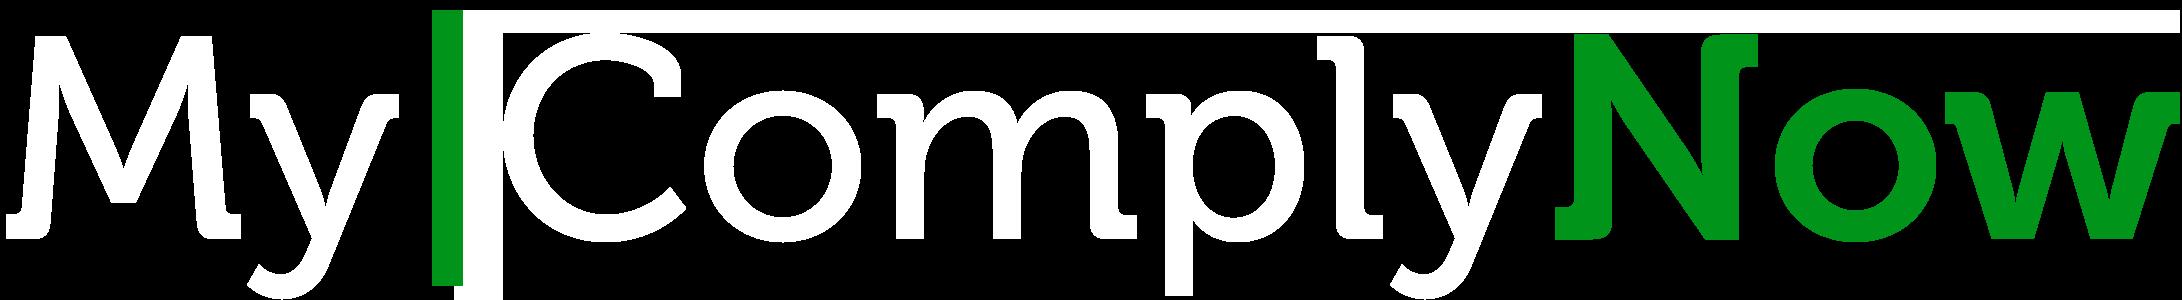 MyComplyNow logo